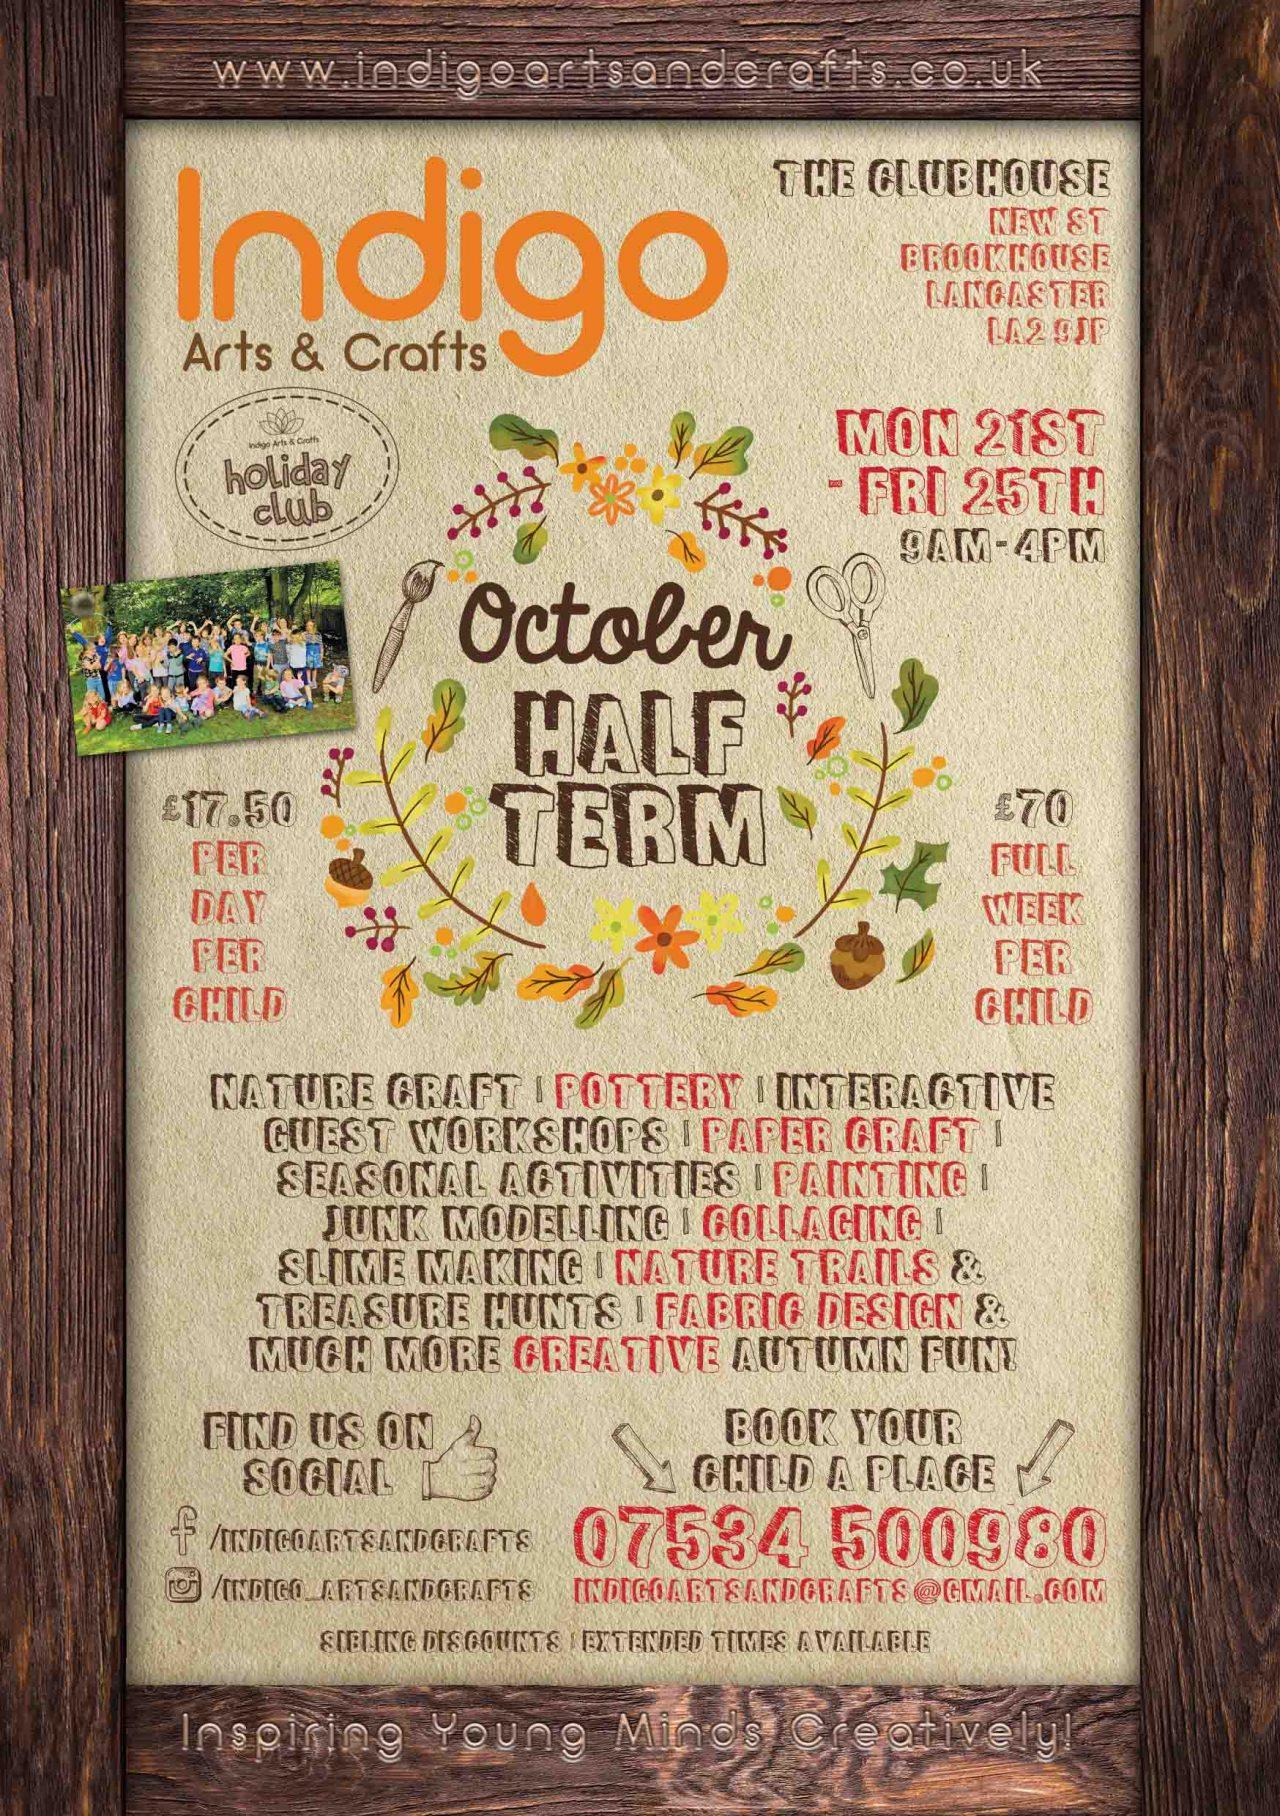 October-Half-Term-Indigo-Arts-Crafts-2019-1280x1816.jpg